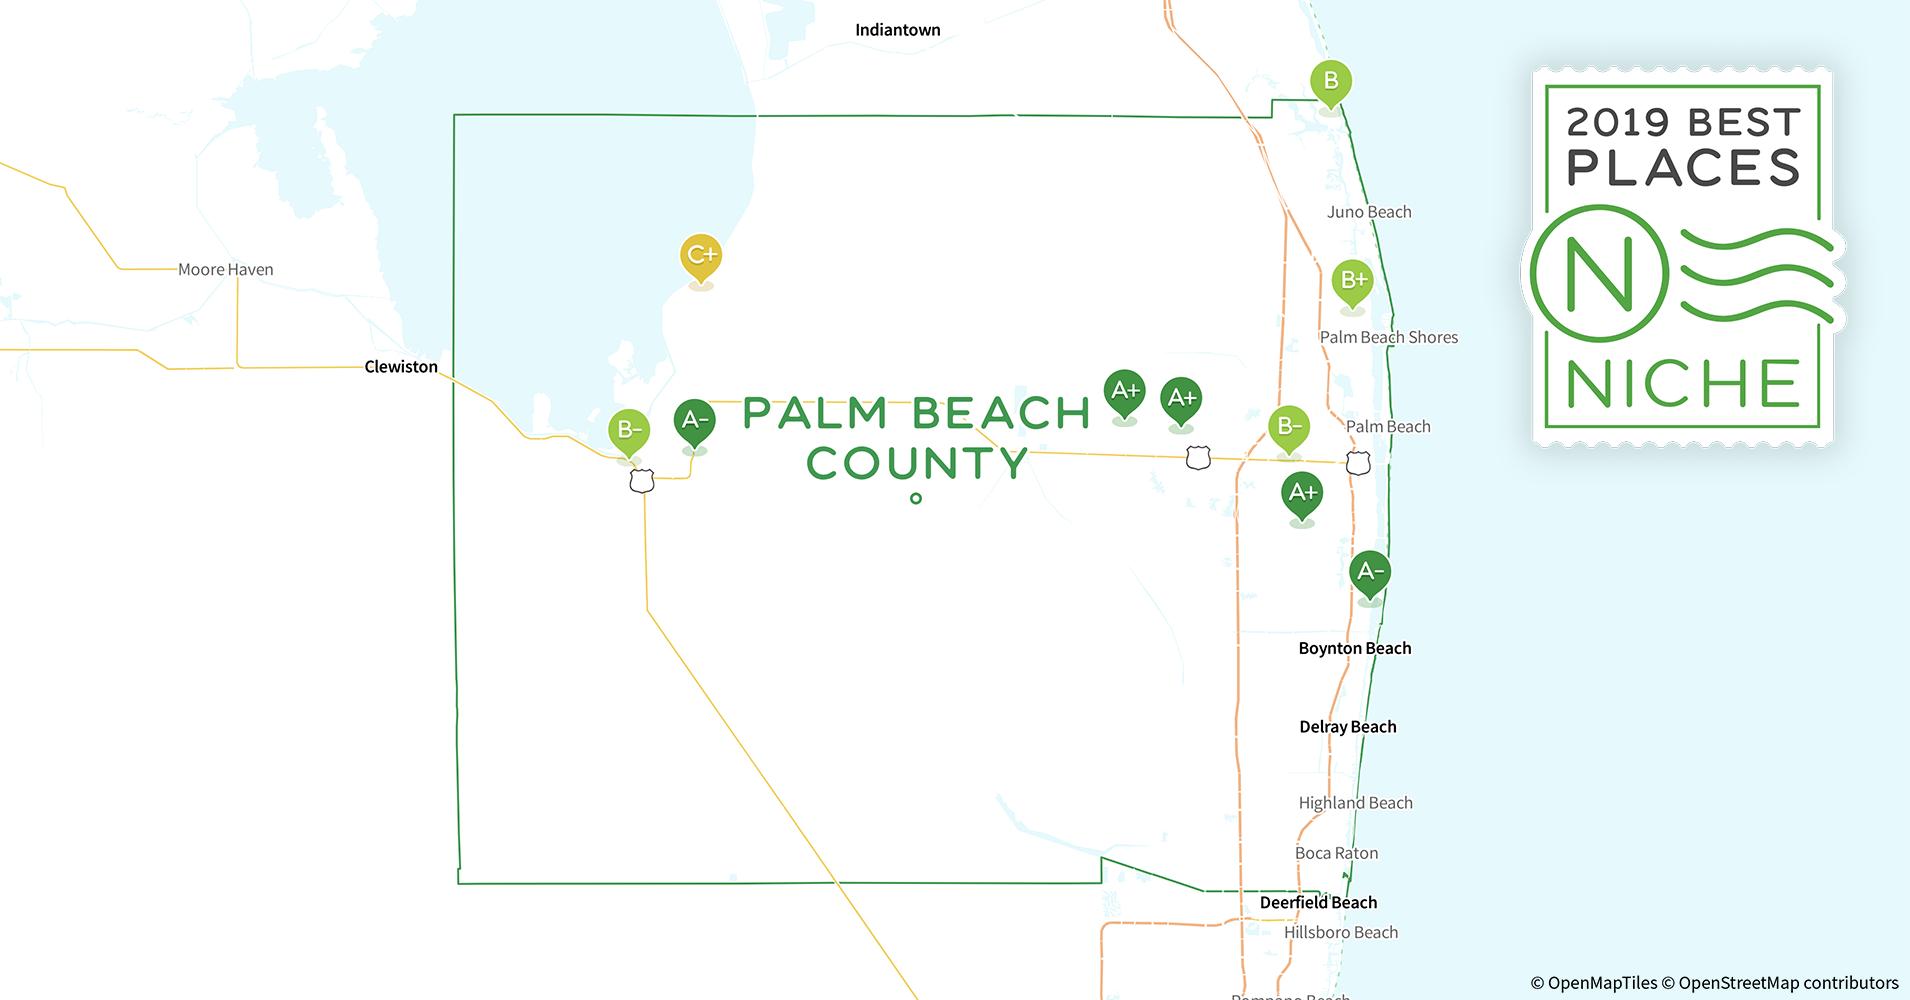 Palm Beach Gardens Zip Code Map.2019 Best Places To Live In Palm Beach County Fl Niche